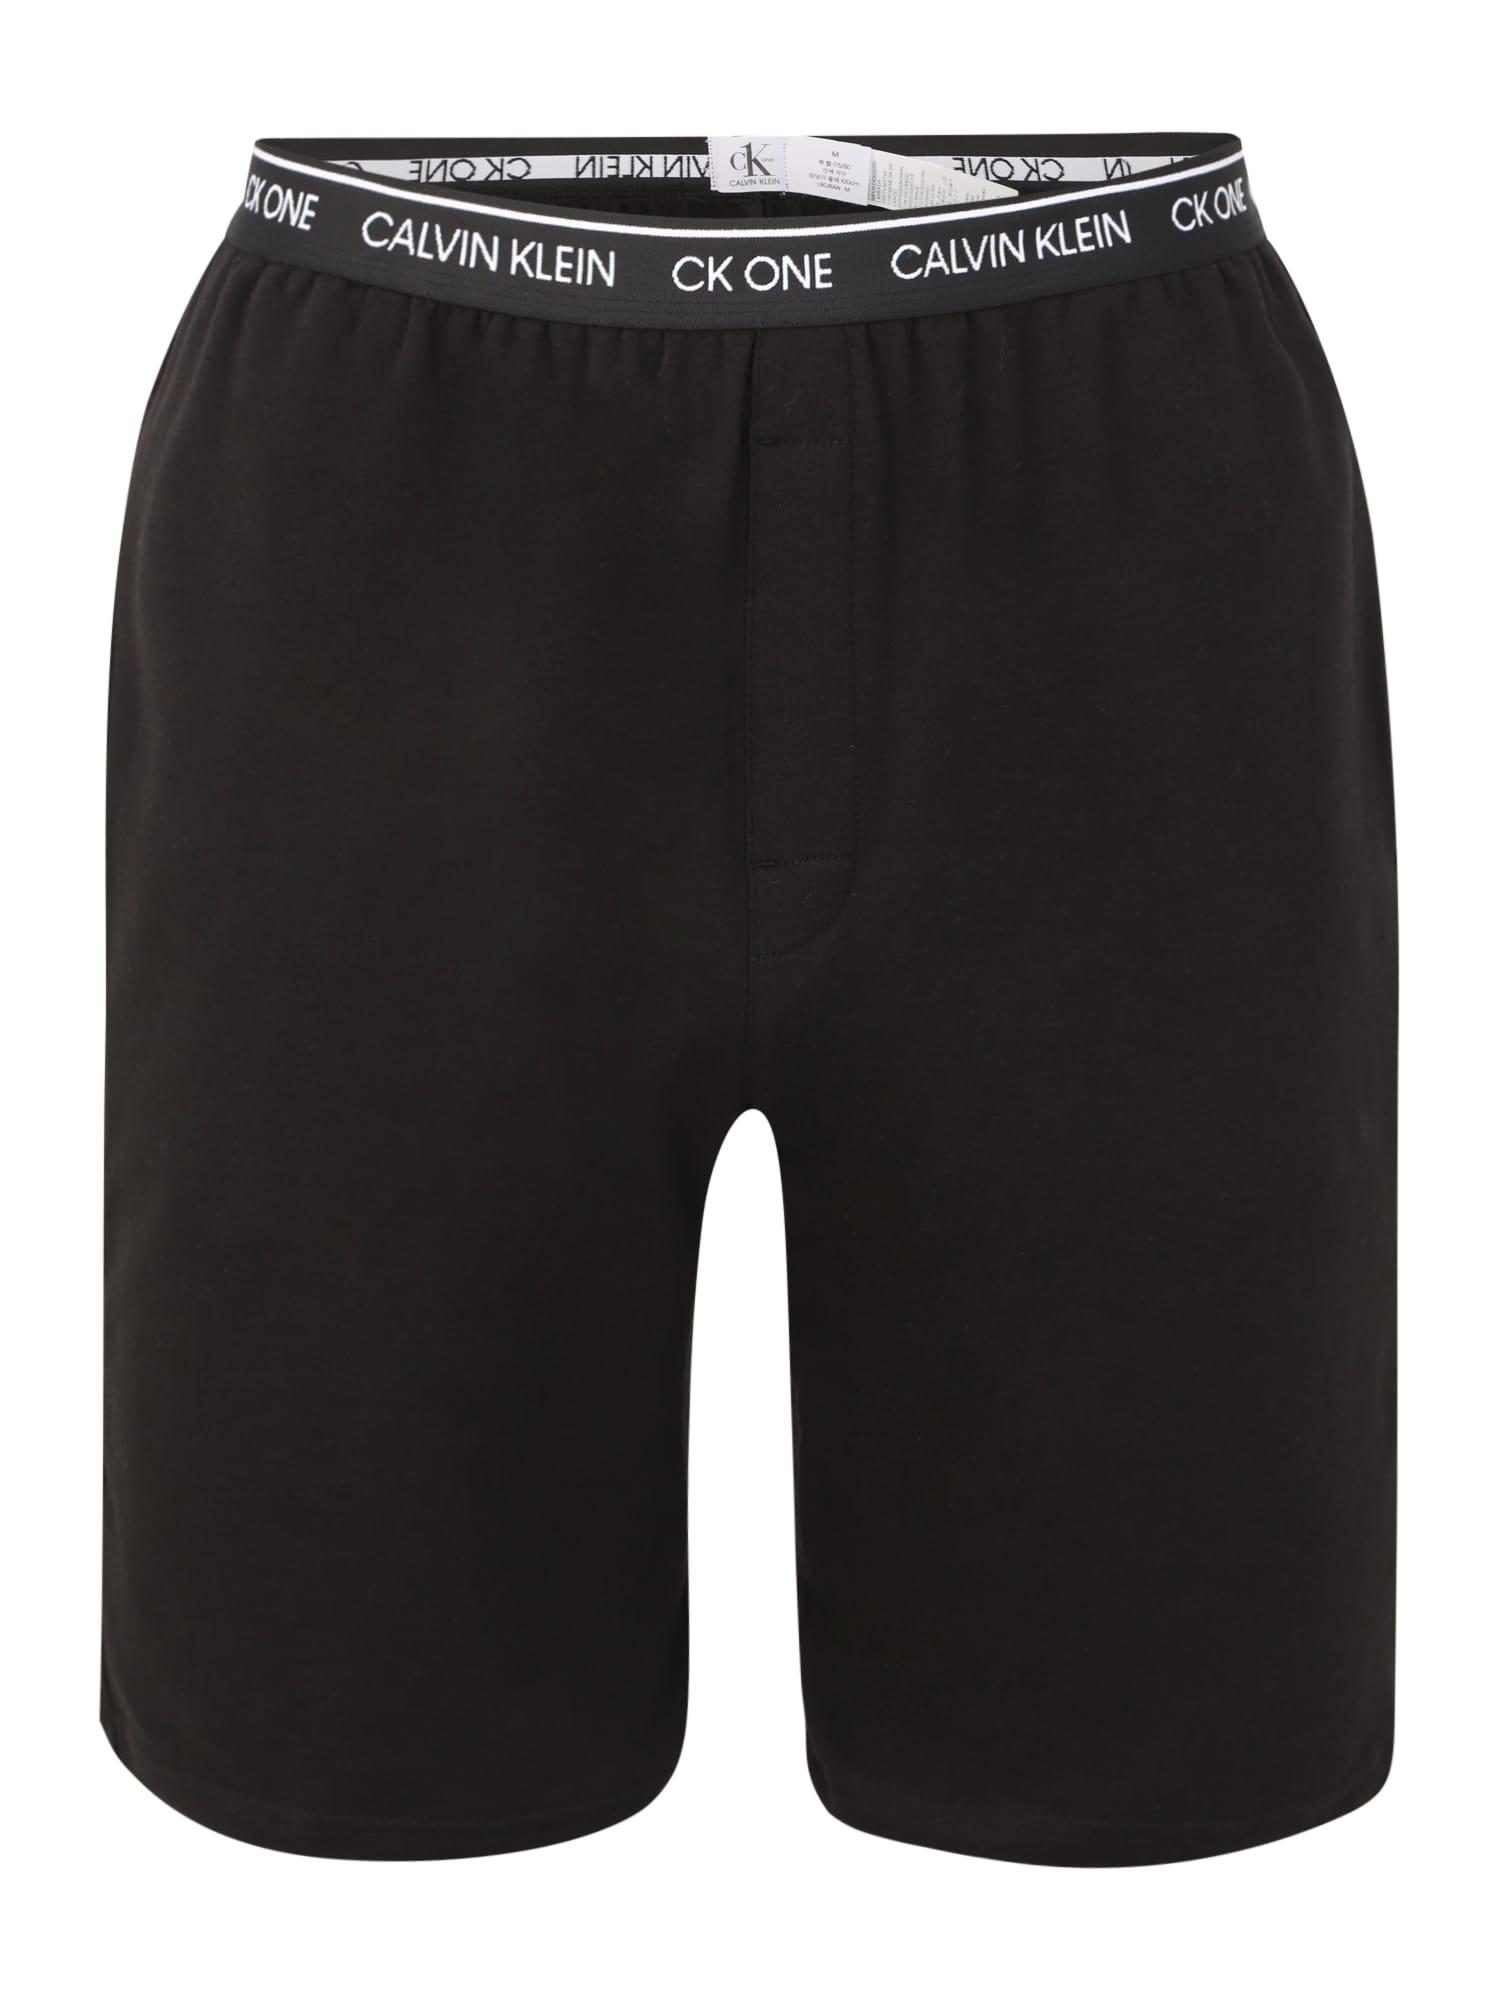 Calvin Klein Underwear Ilgos apatinės kelnaitės juoda